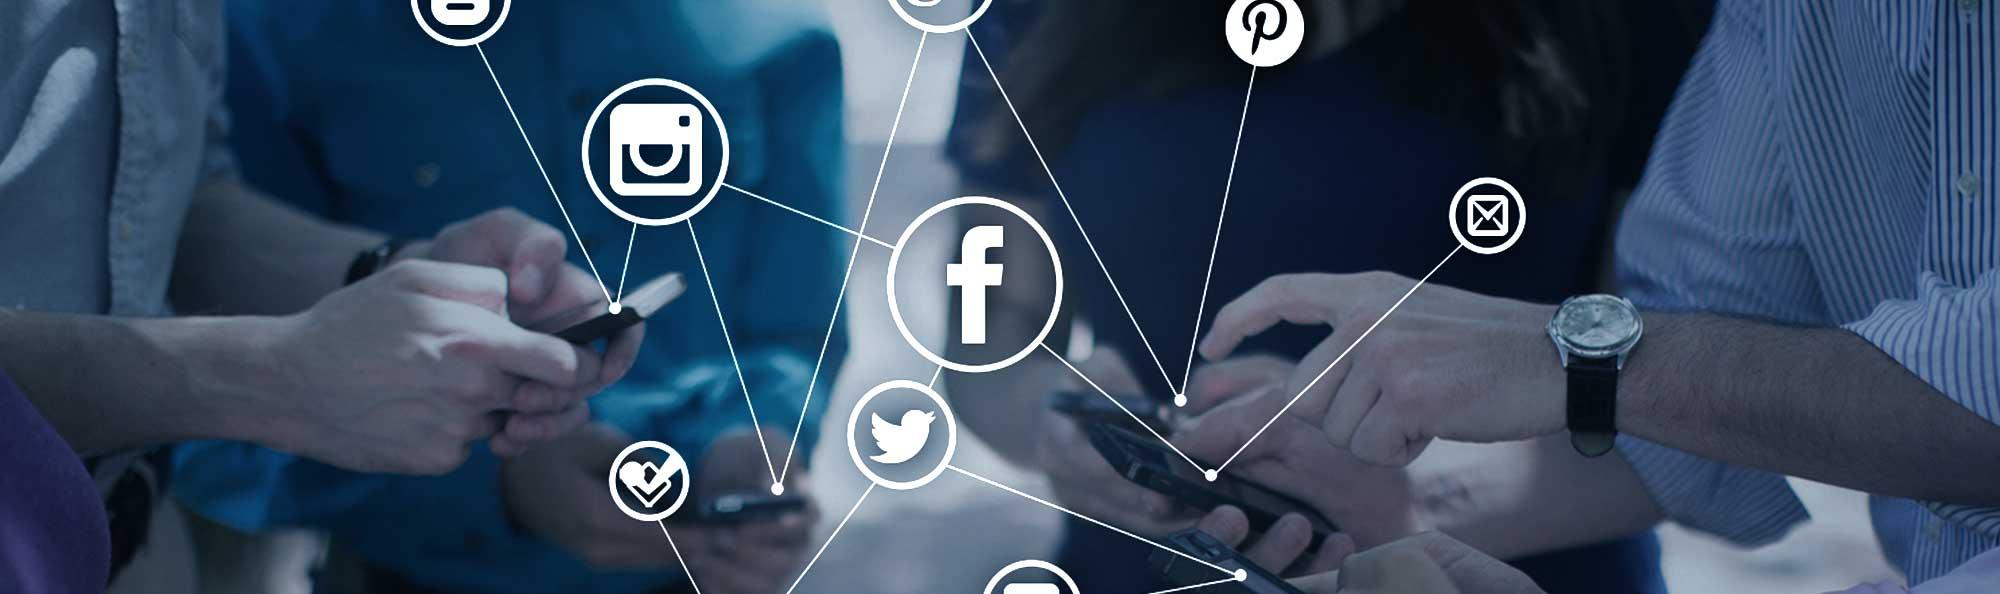 Digiteal marketing - Euromanagement